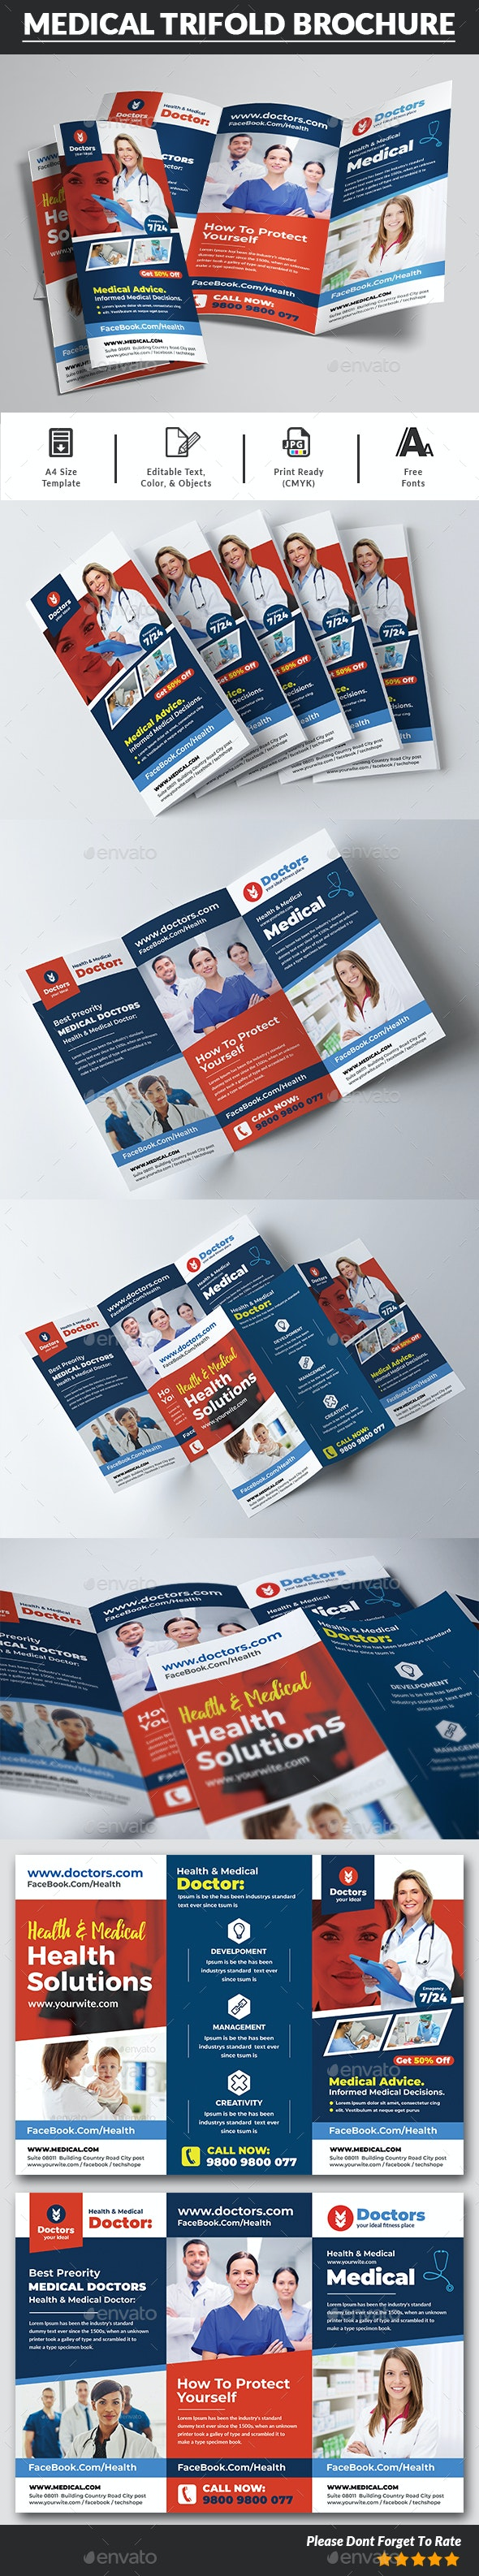 Health & Medical Doctors Trifold Brochure - Corporate Brochures